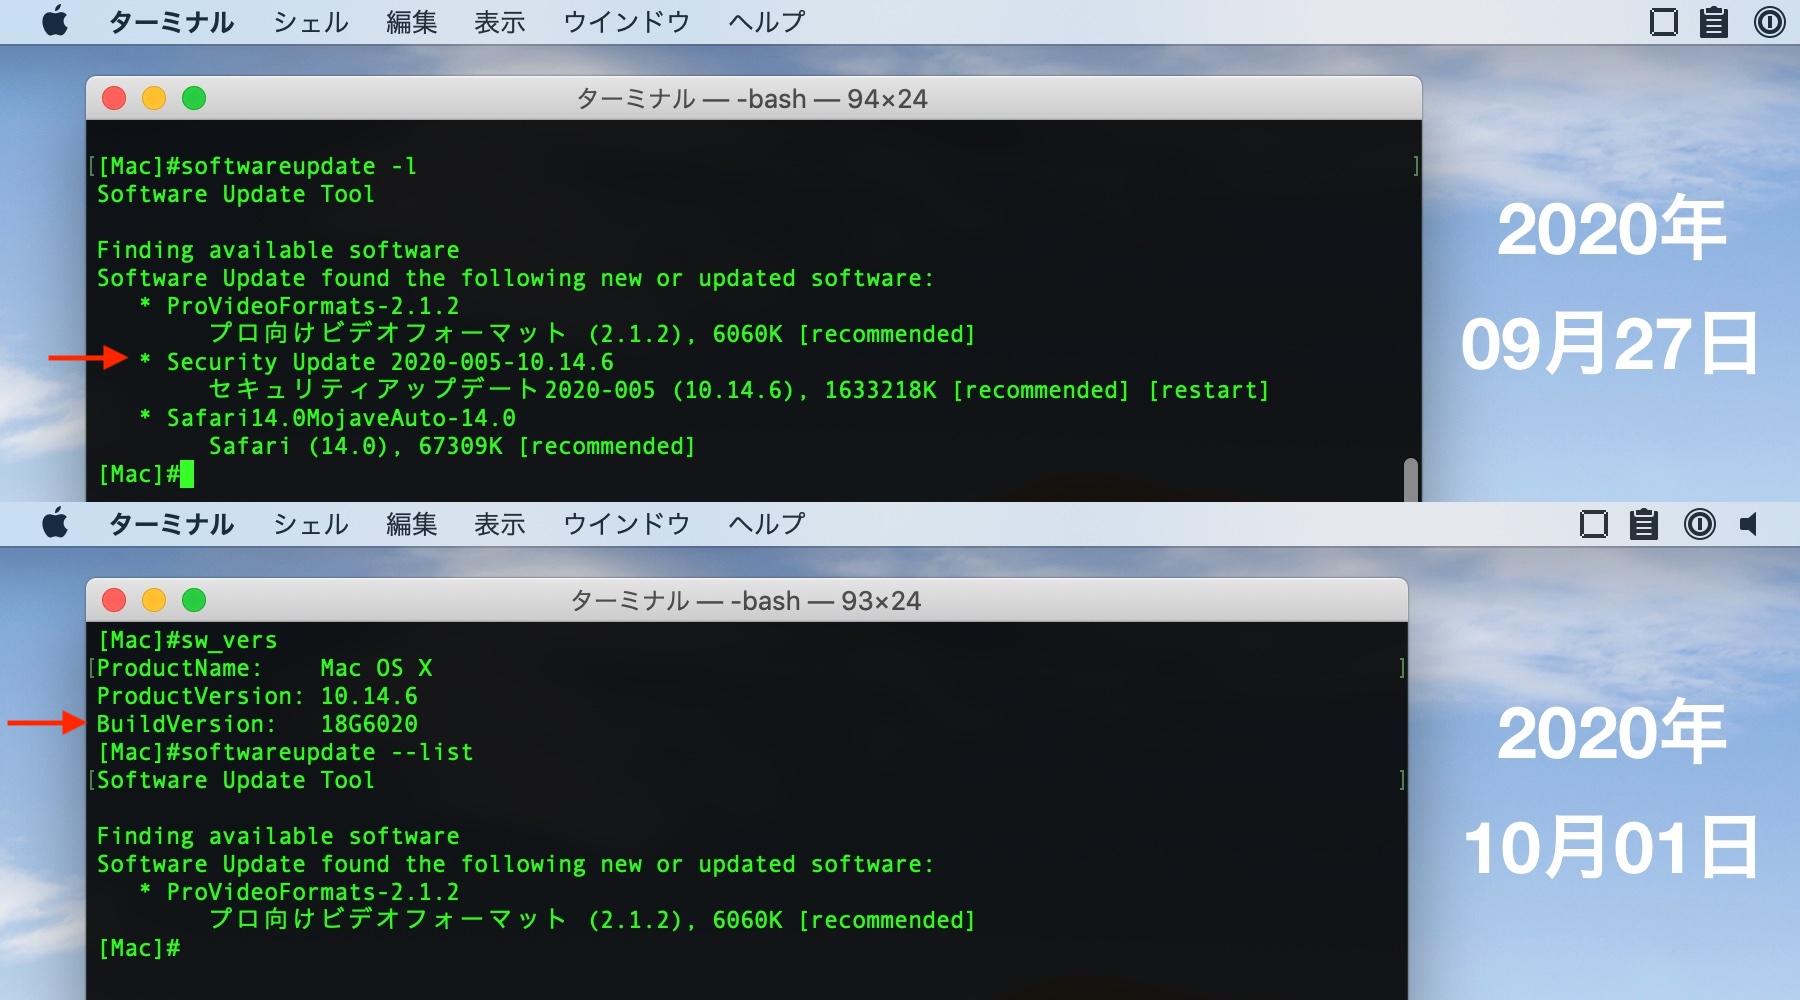 macOS 10.14.6 Mojave Build 18G6032